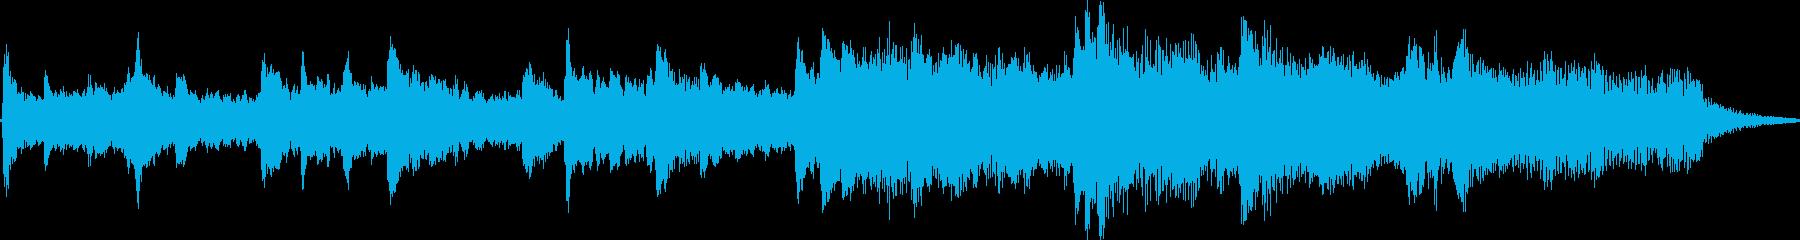 BGM whose transparent piano tone is impressive's reproduced waveform